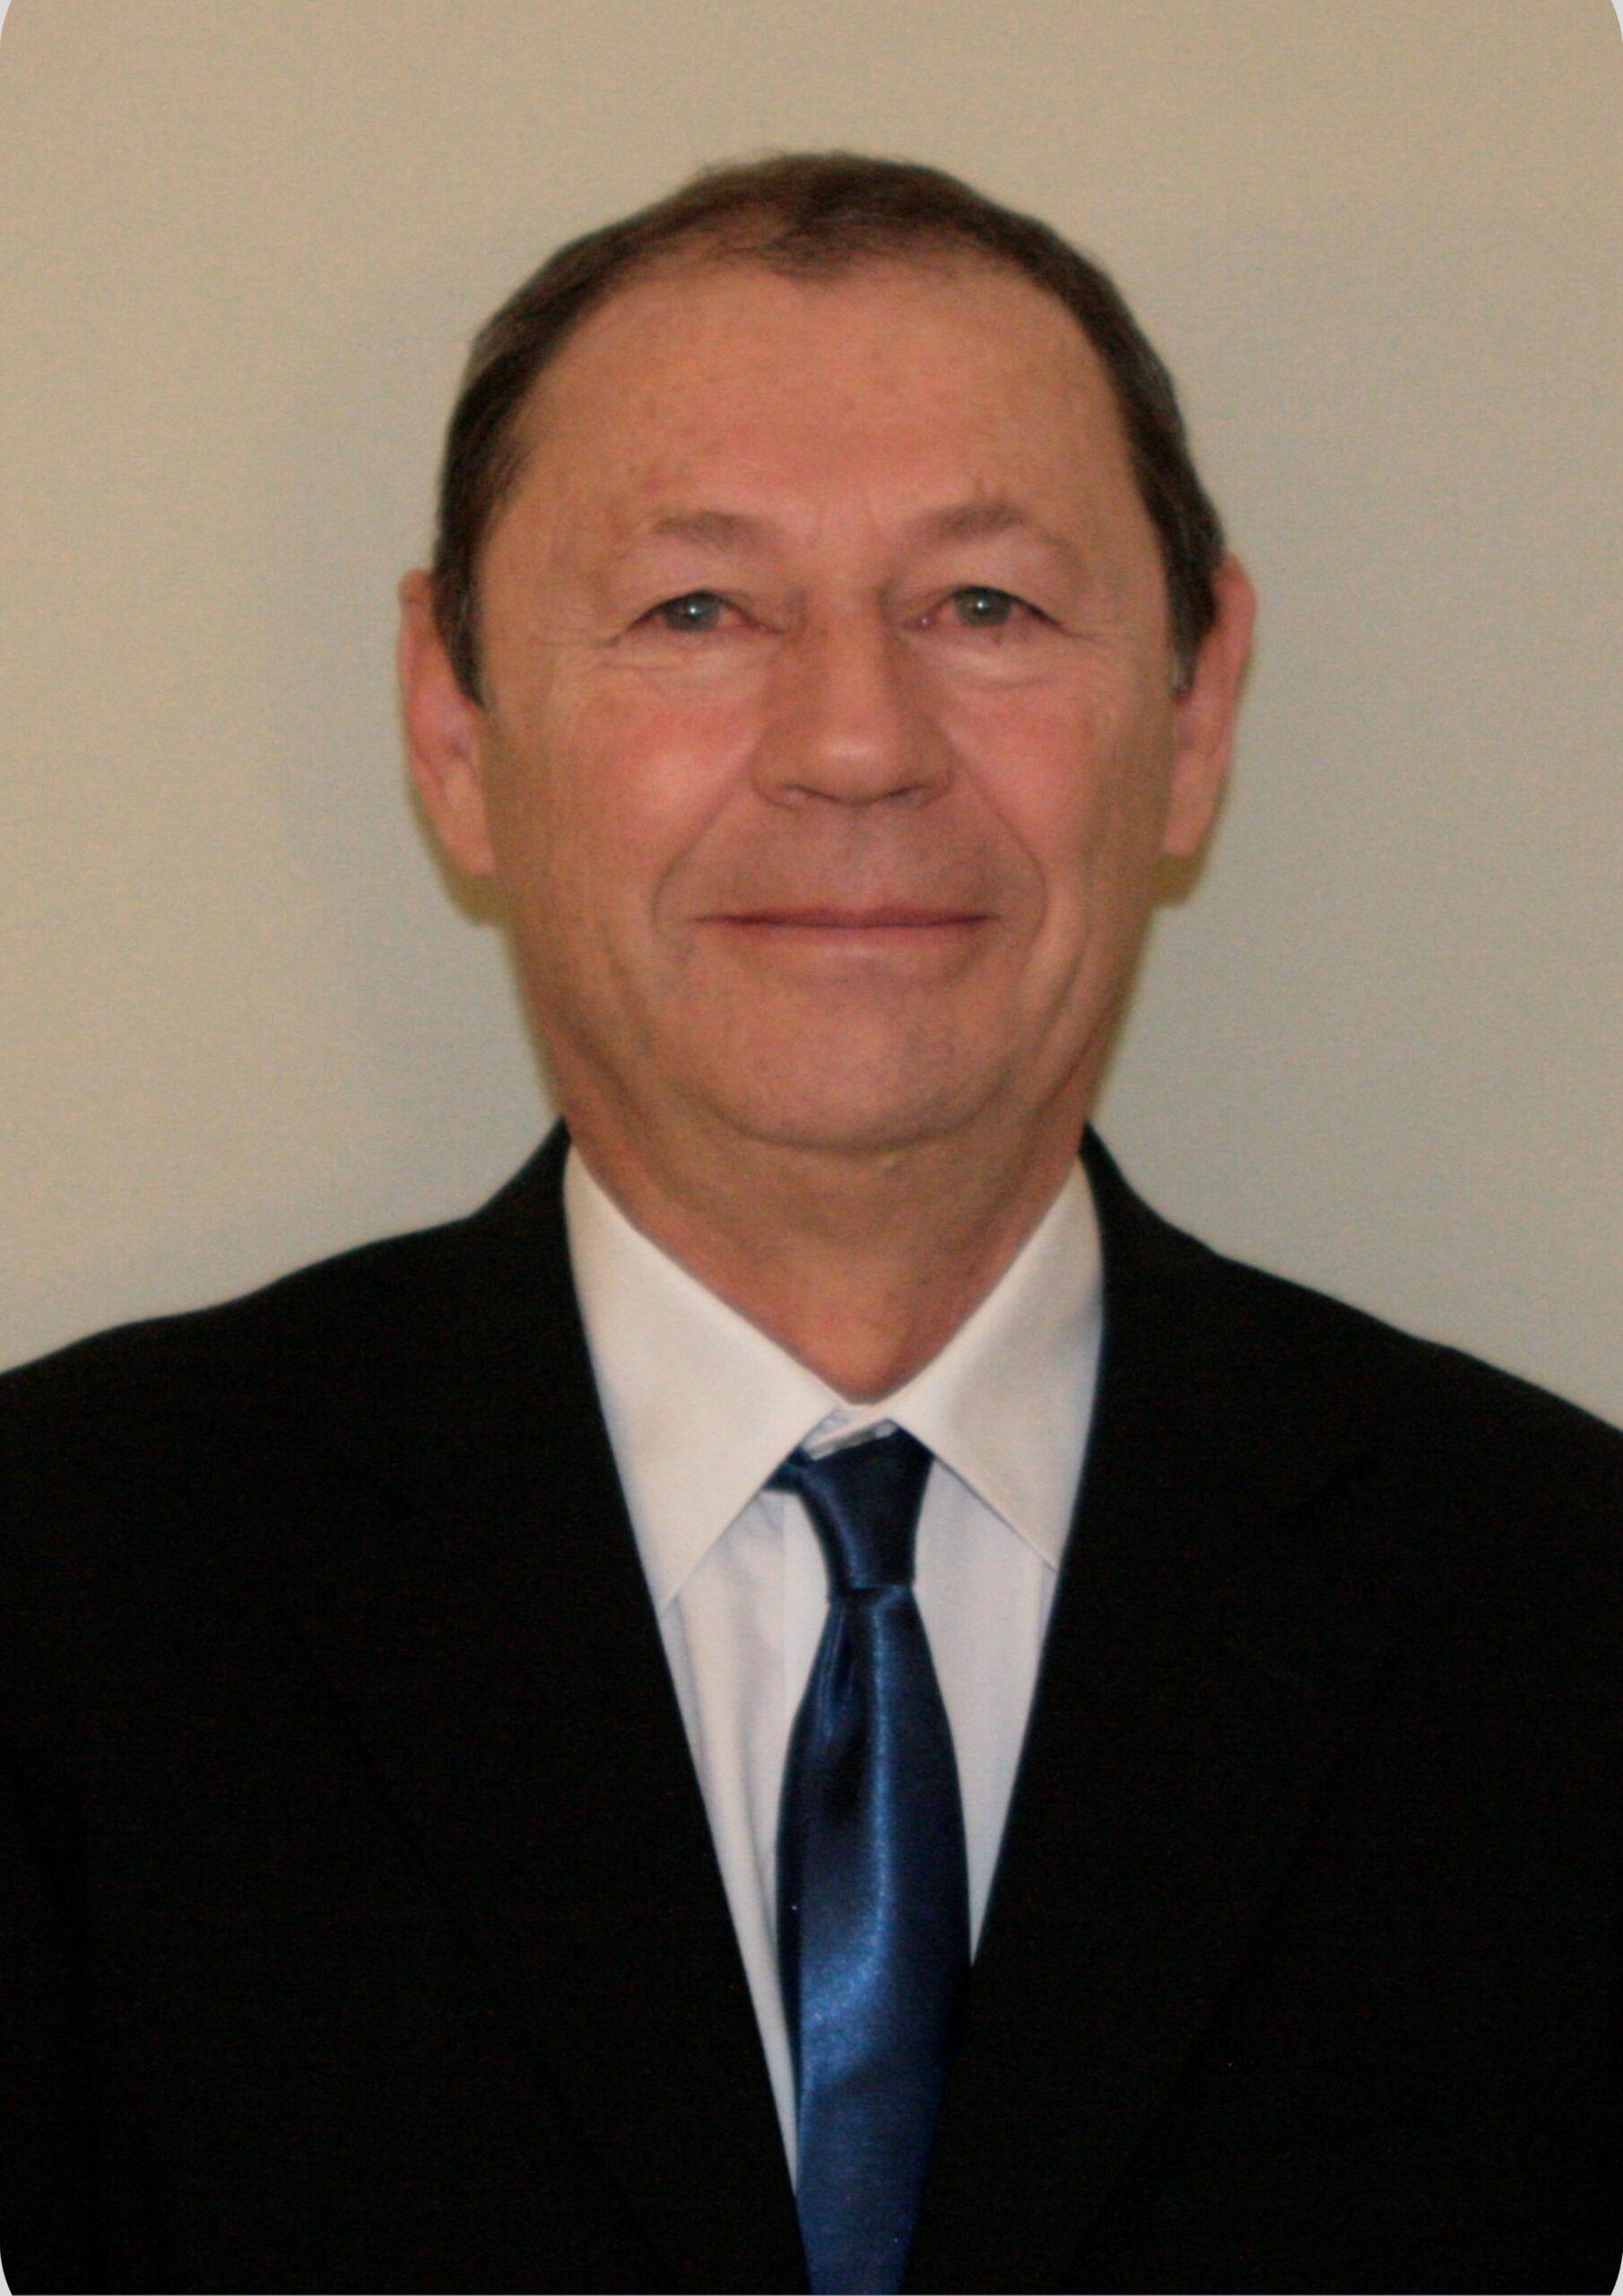 Dr. Daniel Rouan